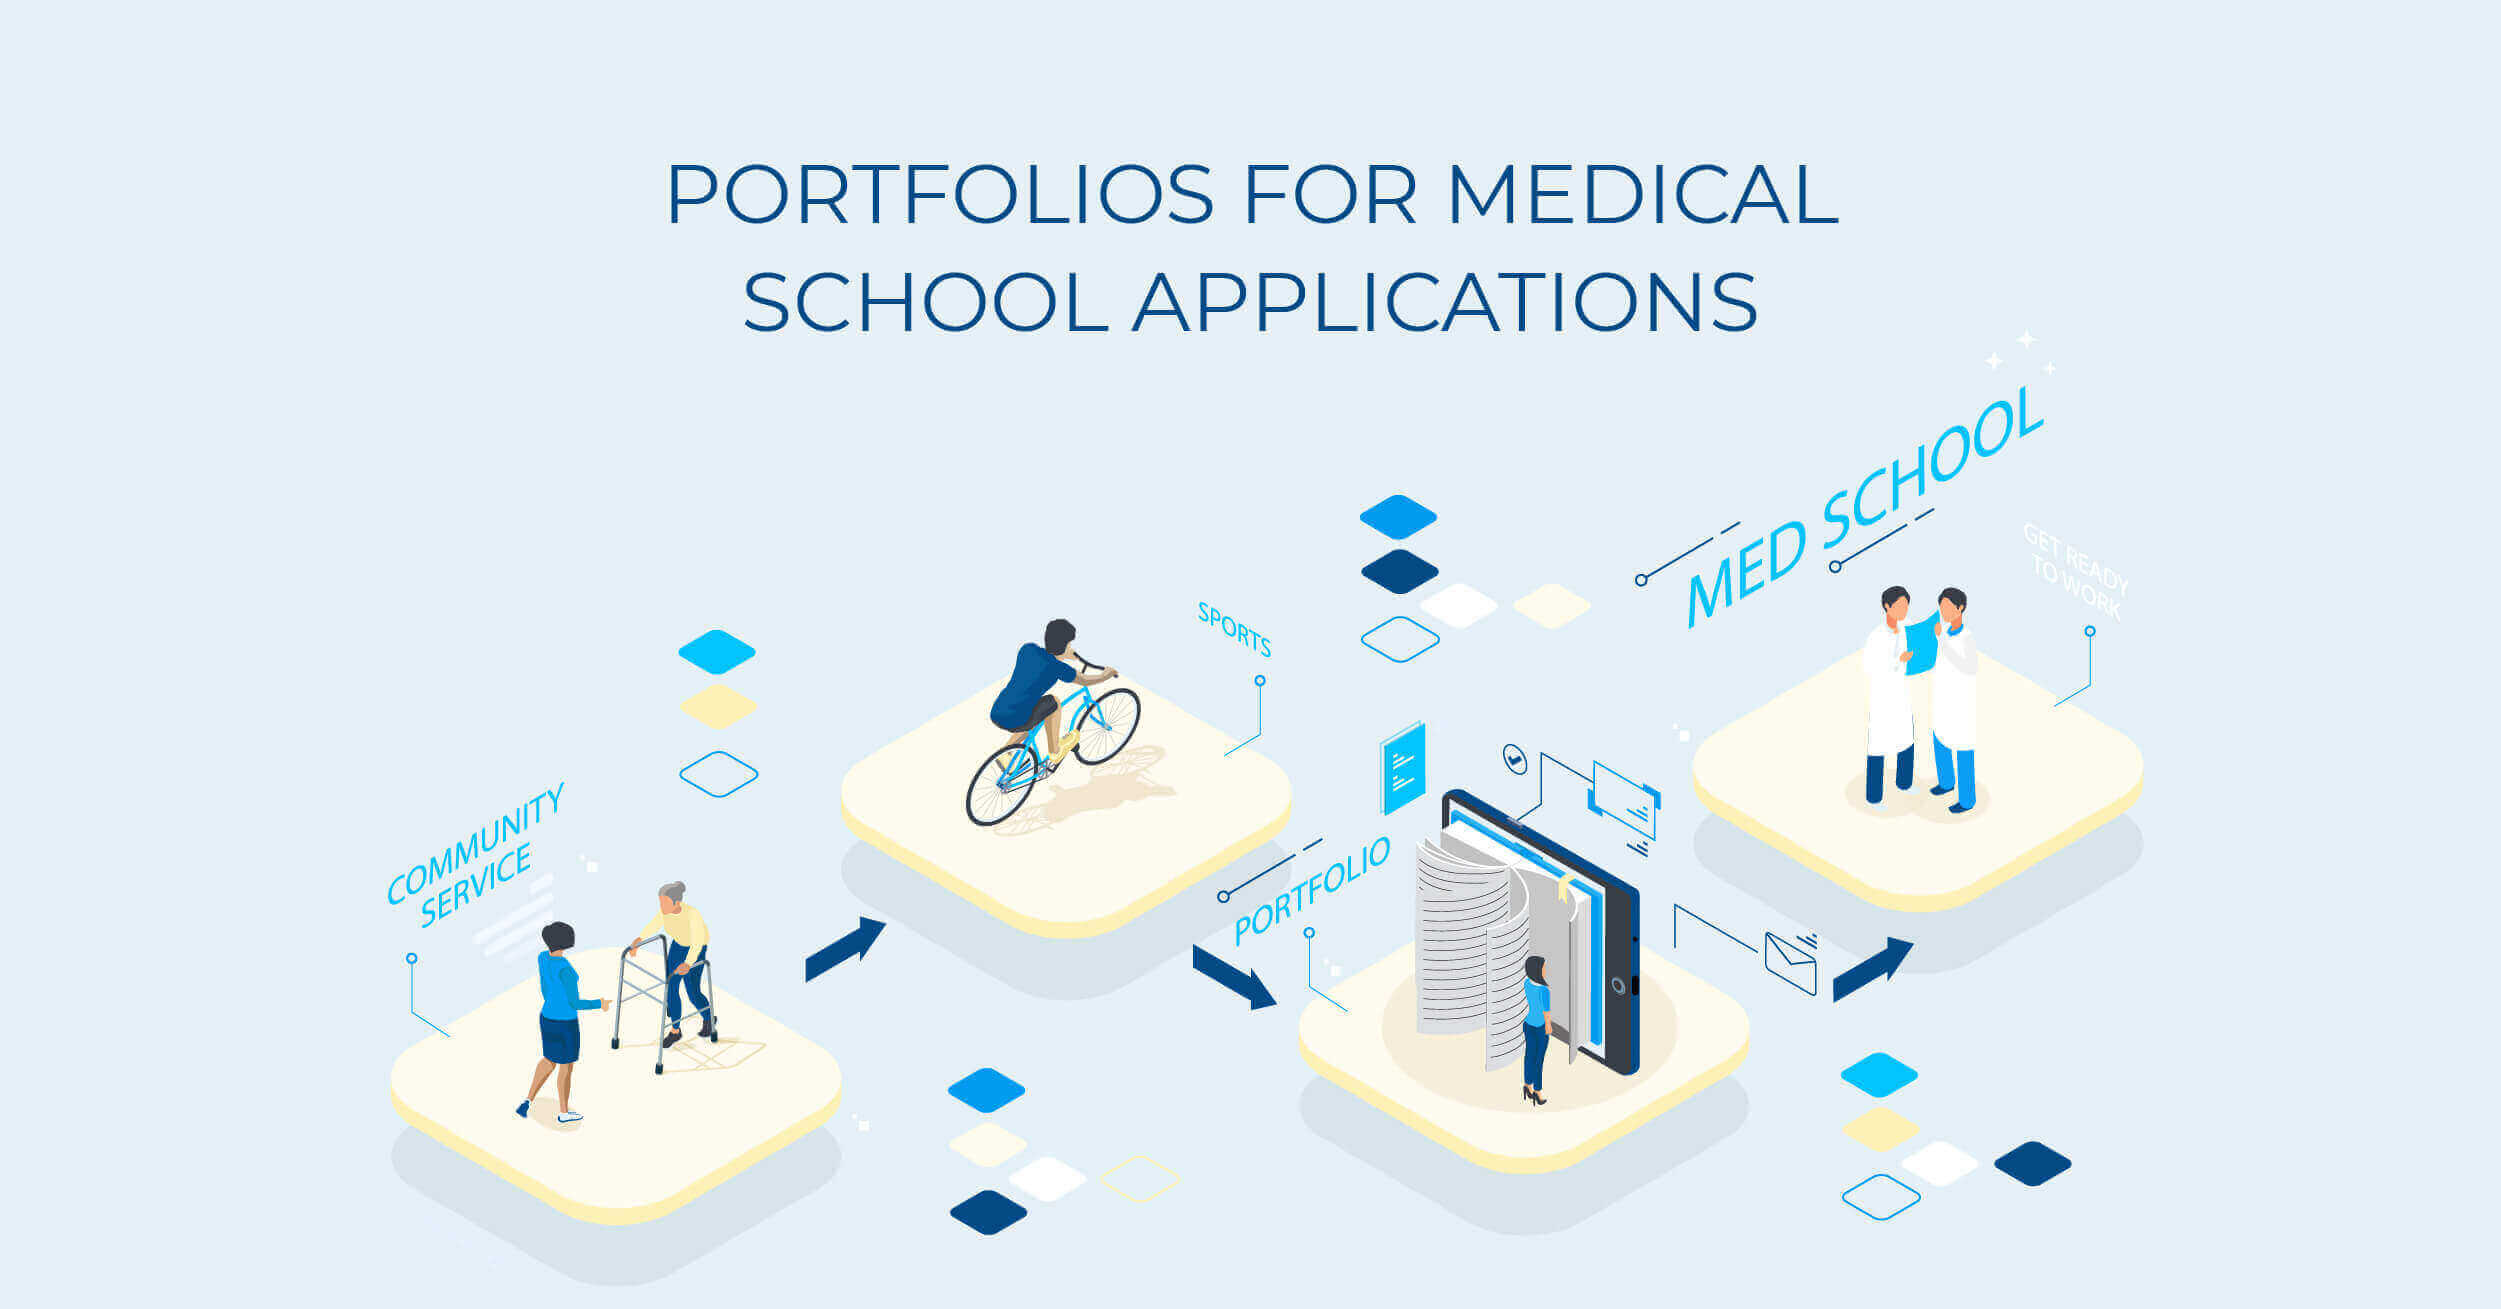 medical portfolio application